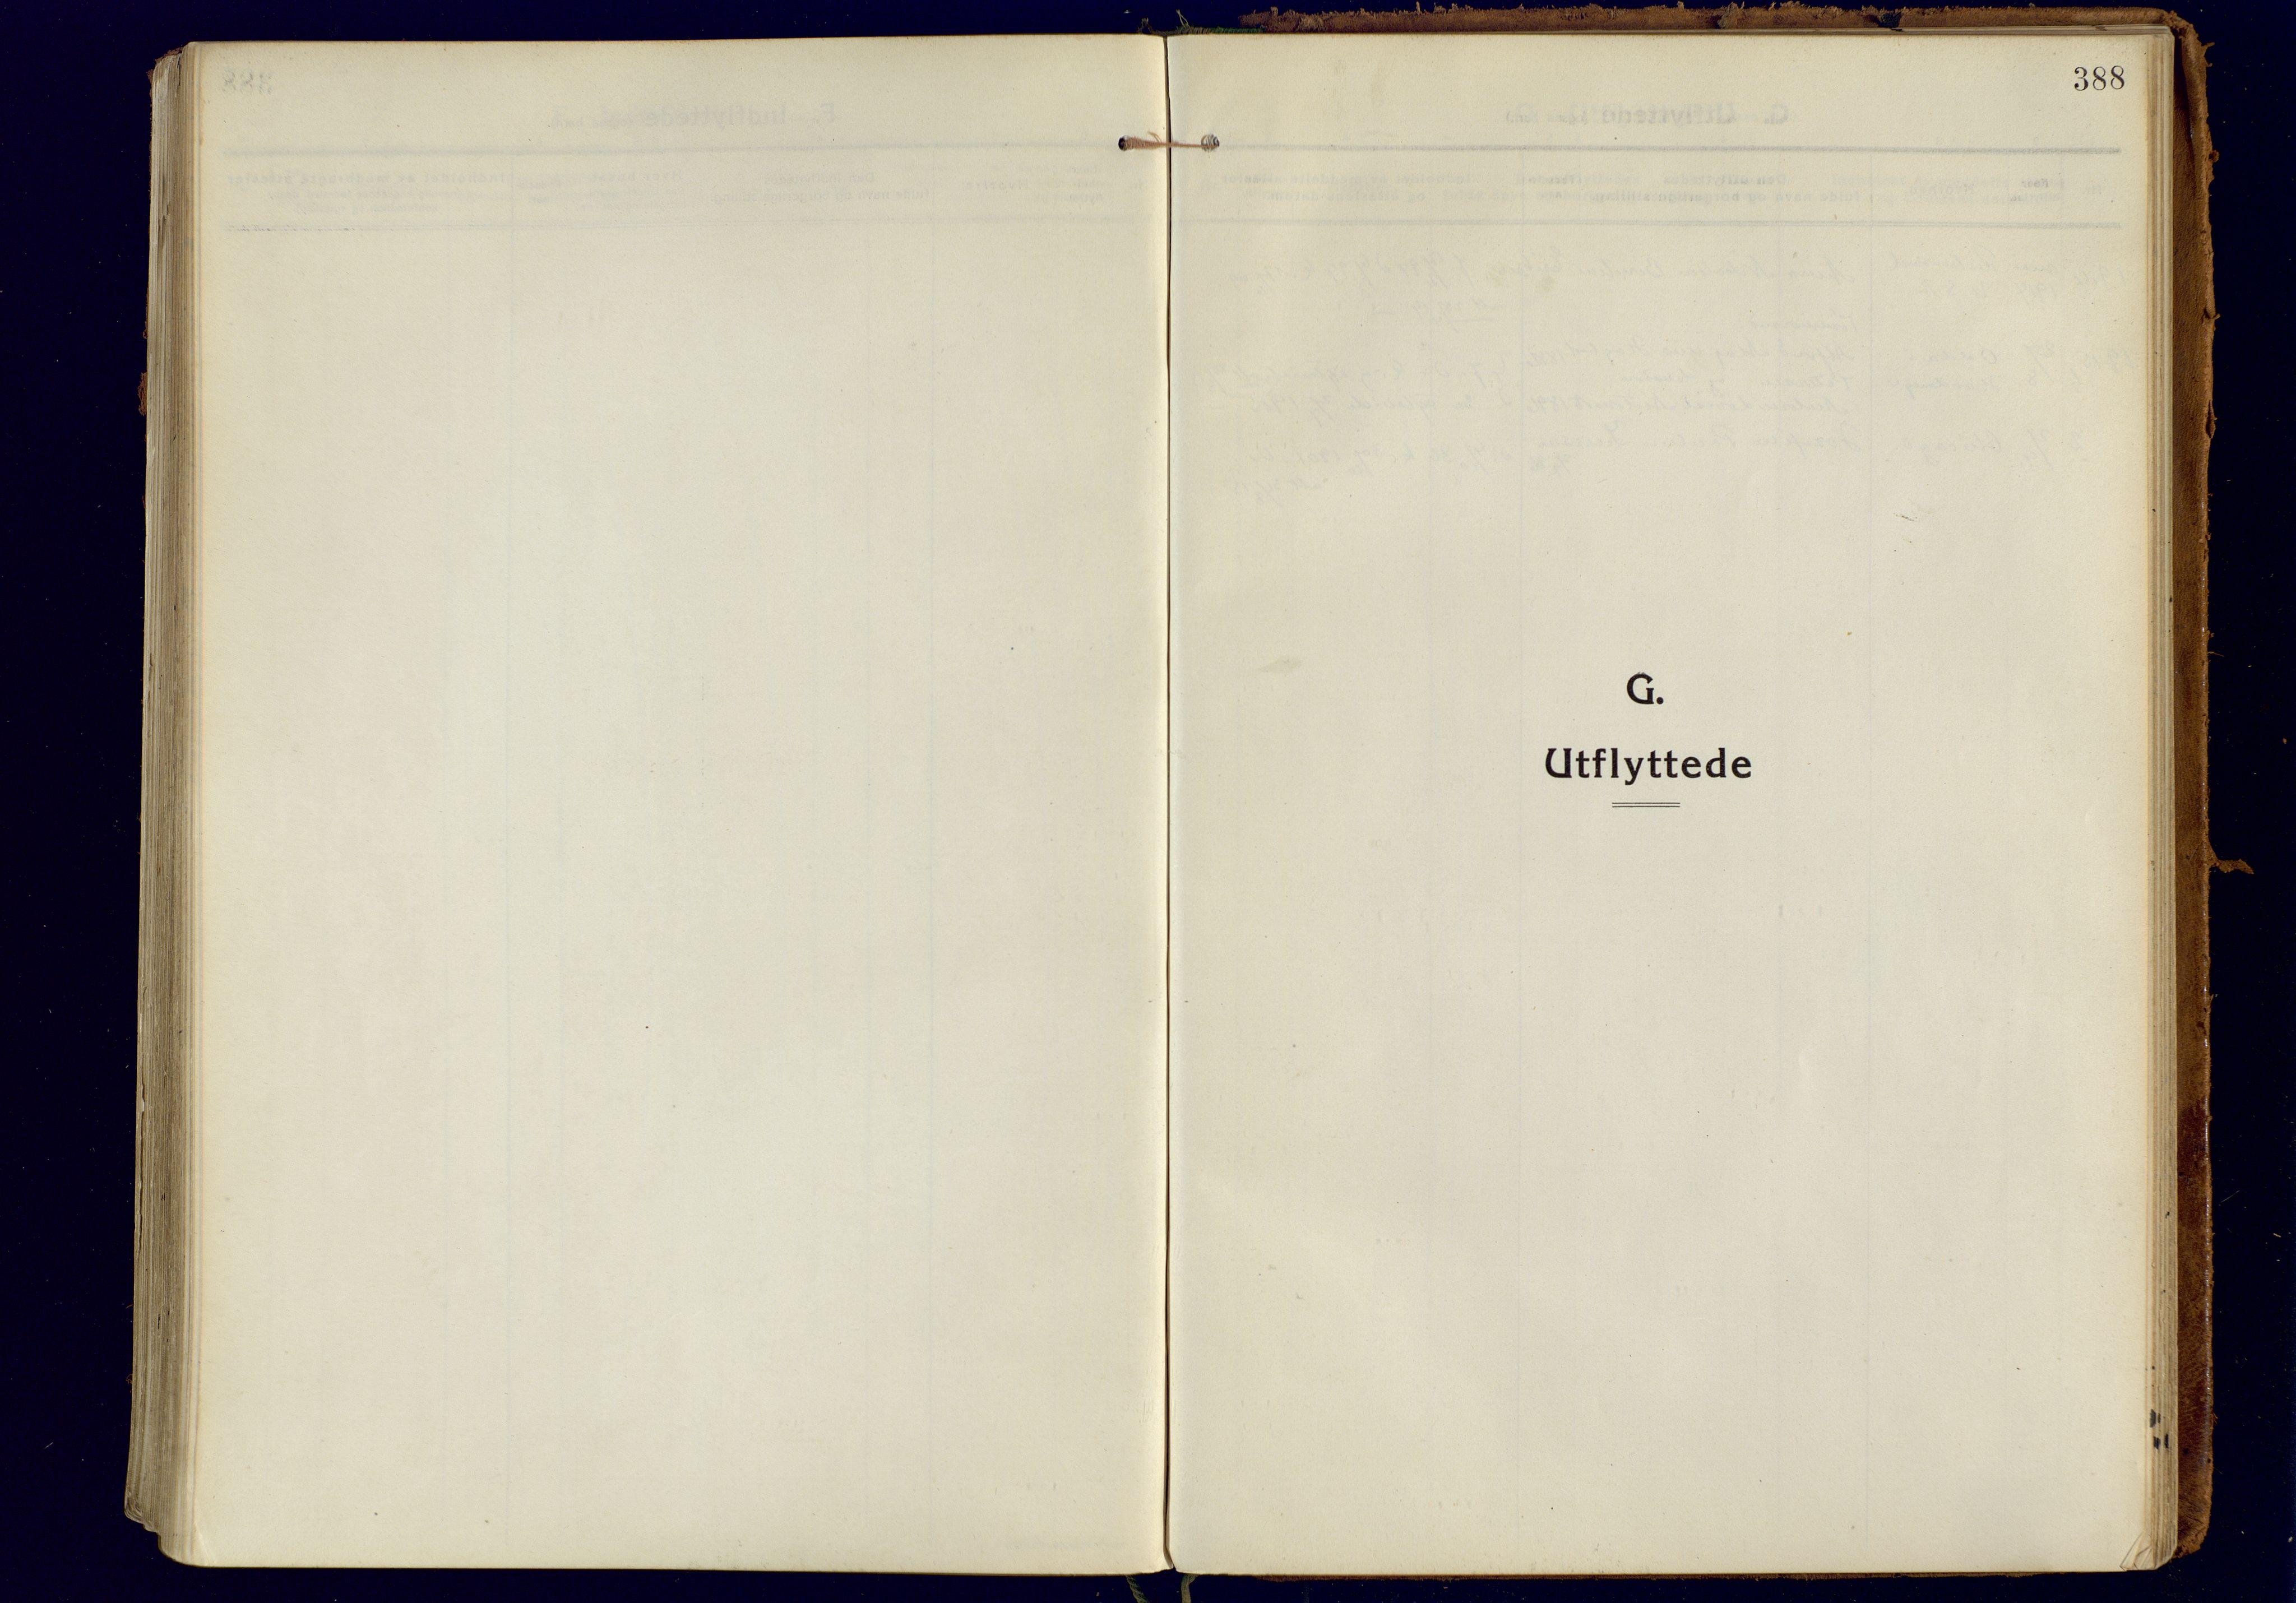 SATØ, Tromsøysund sokneprestkontor, G/Ga: Ministerialbok nr. 8, 1914-1922, s. 385